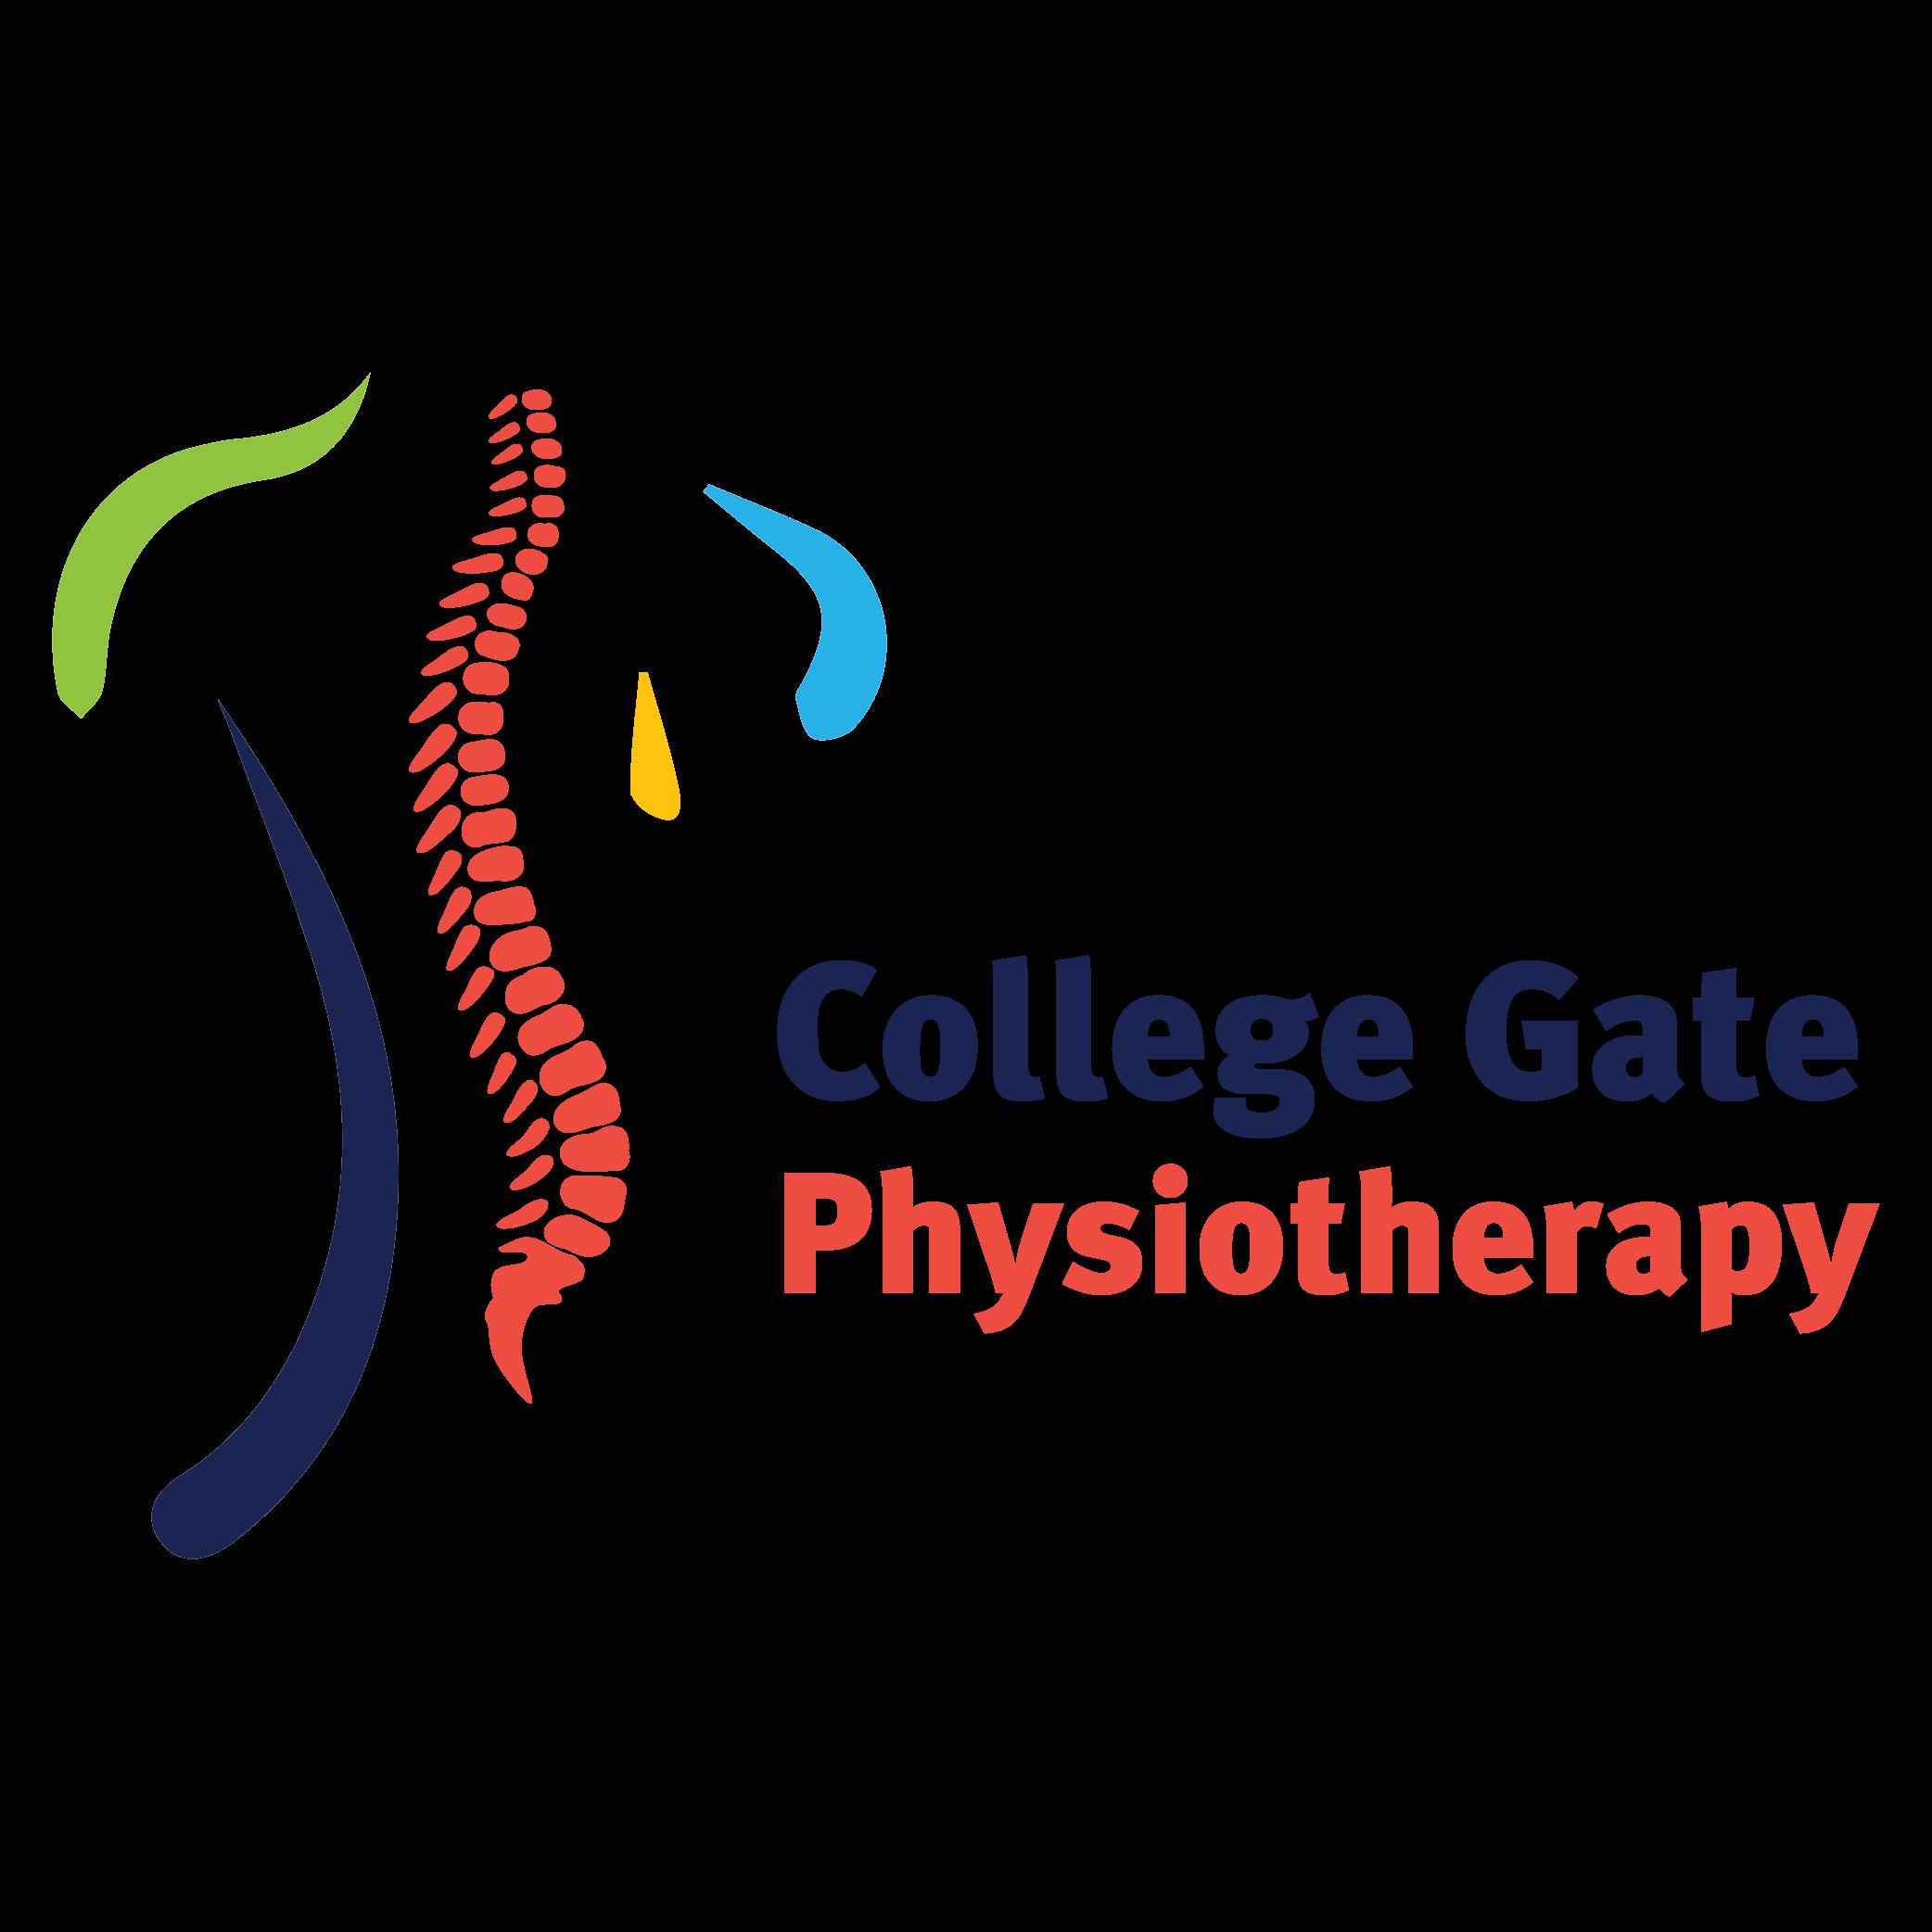 Physio Logos.